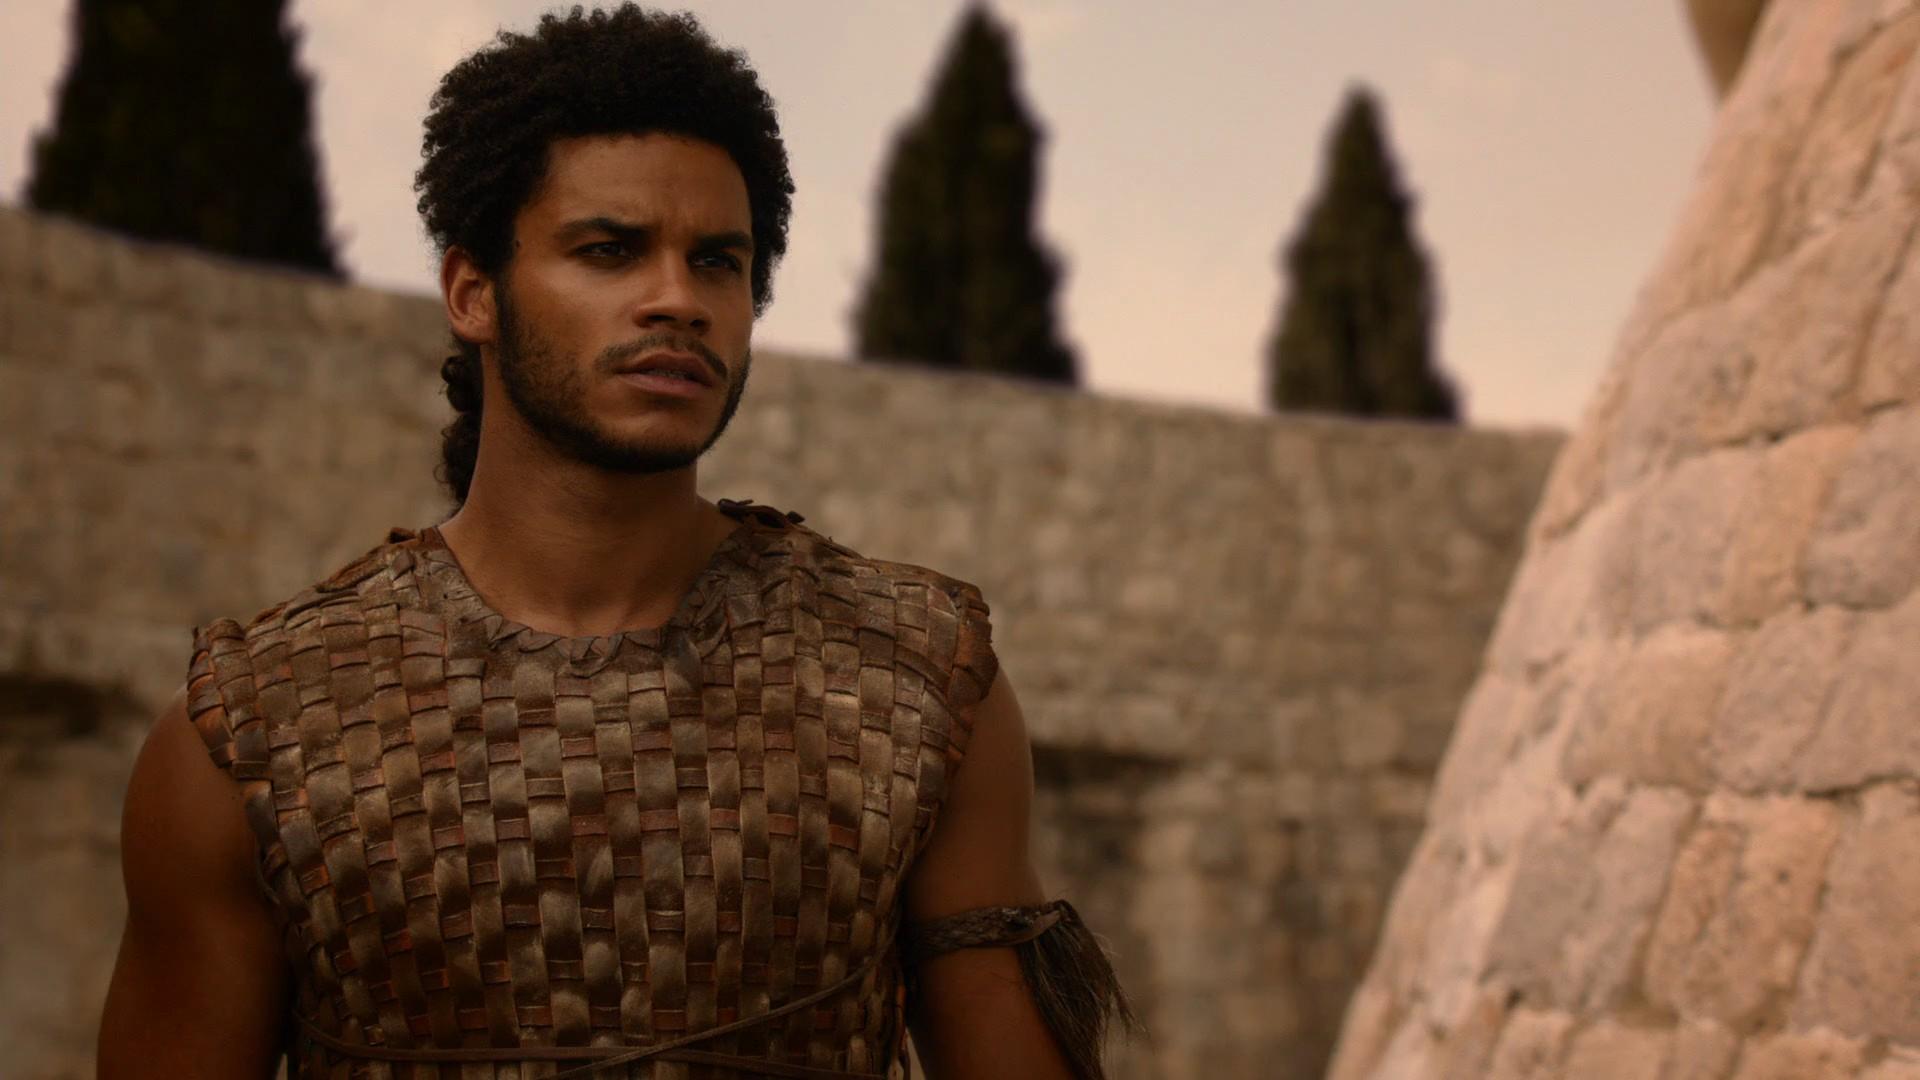 enlaces game of thrones temporada 2 completa 2012 brrip 1080p